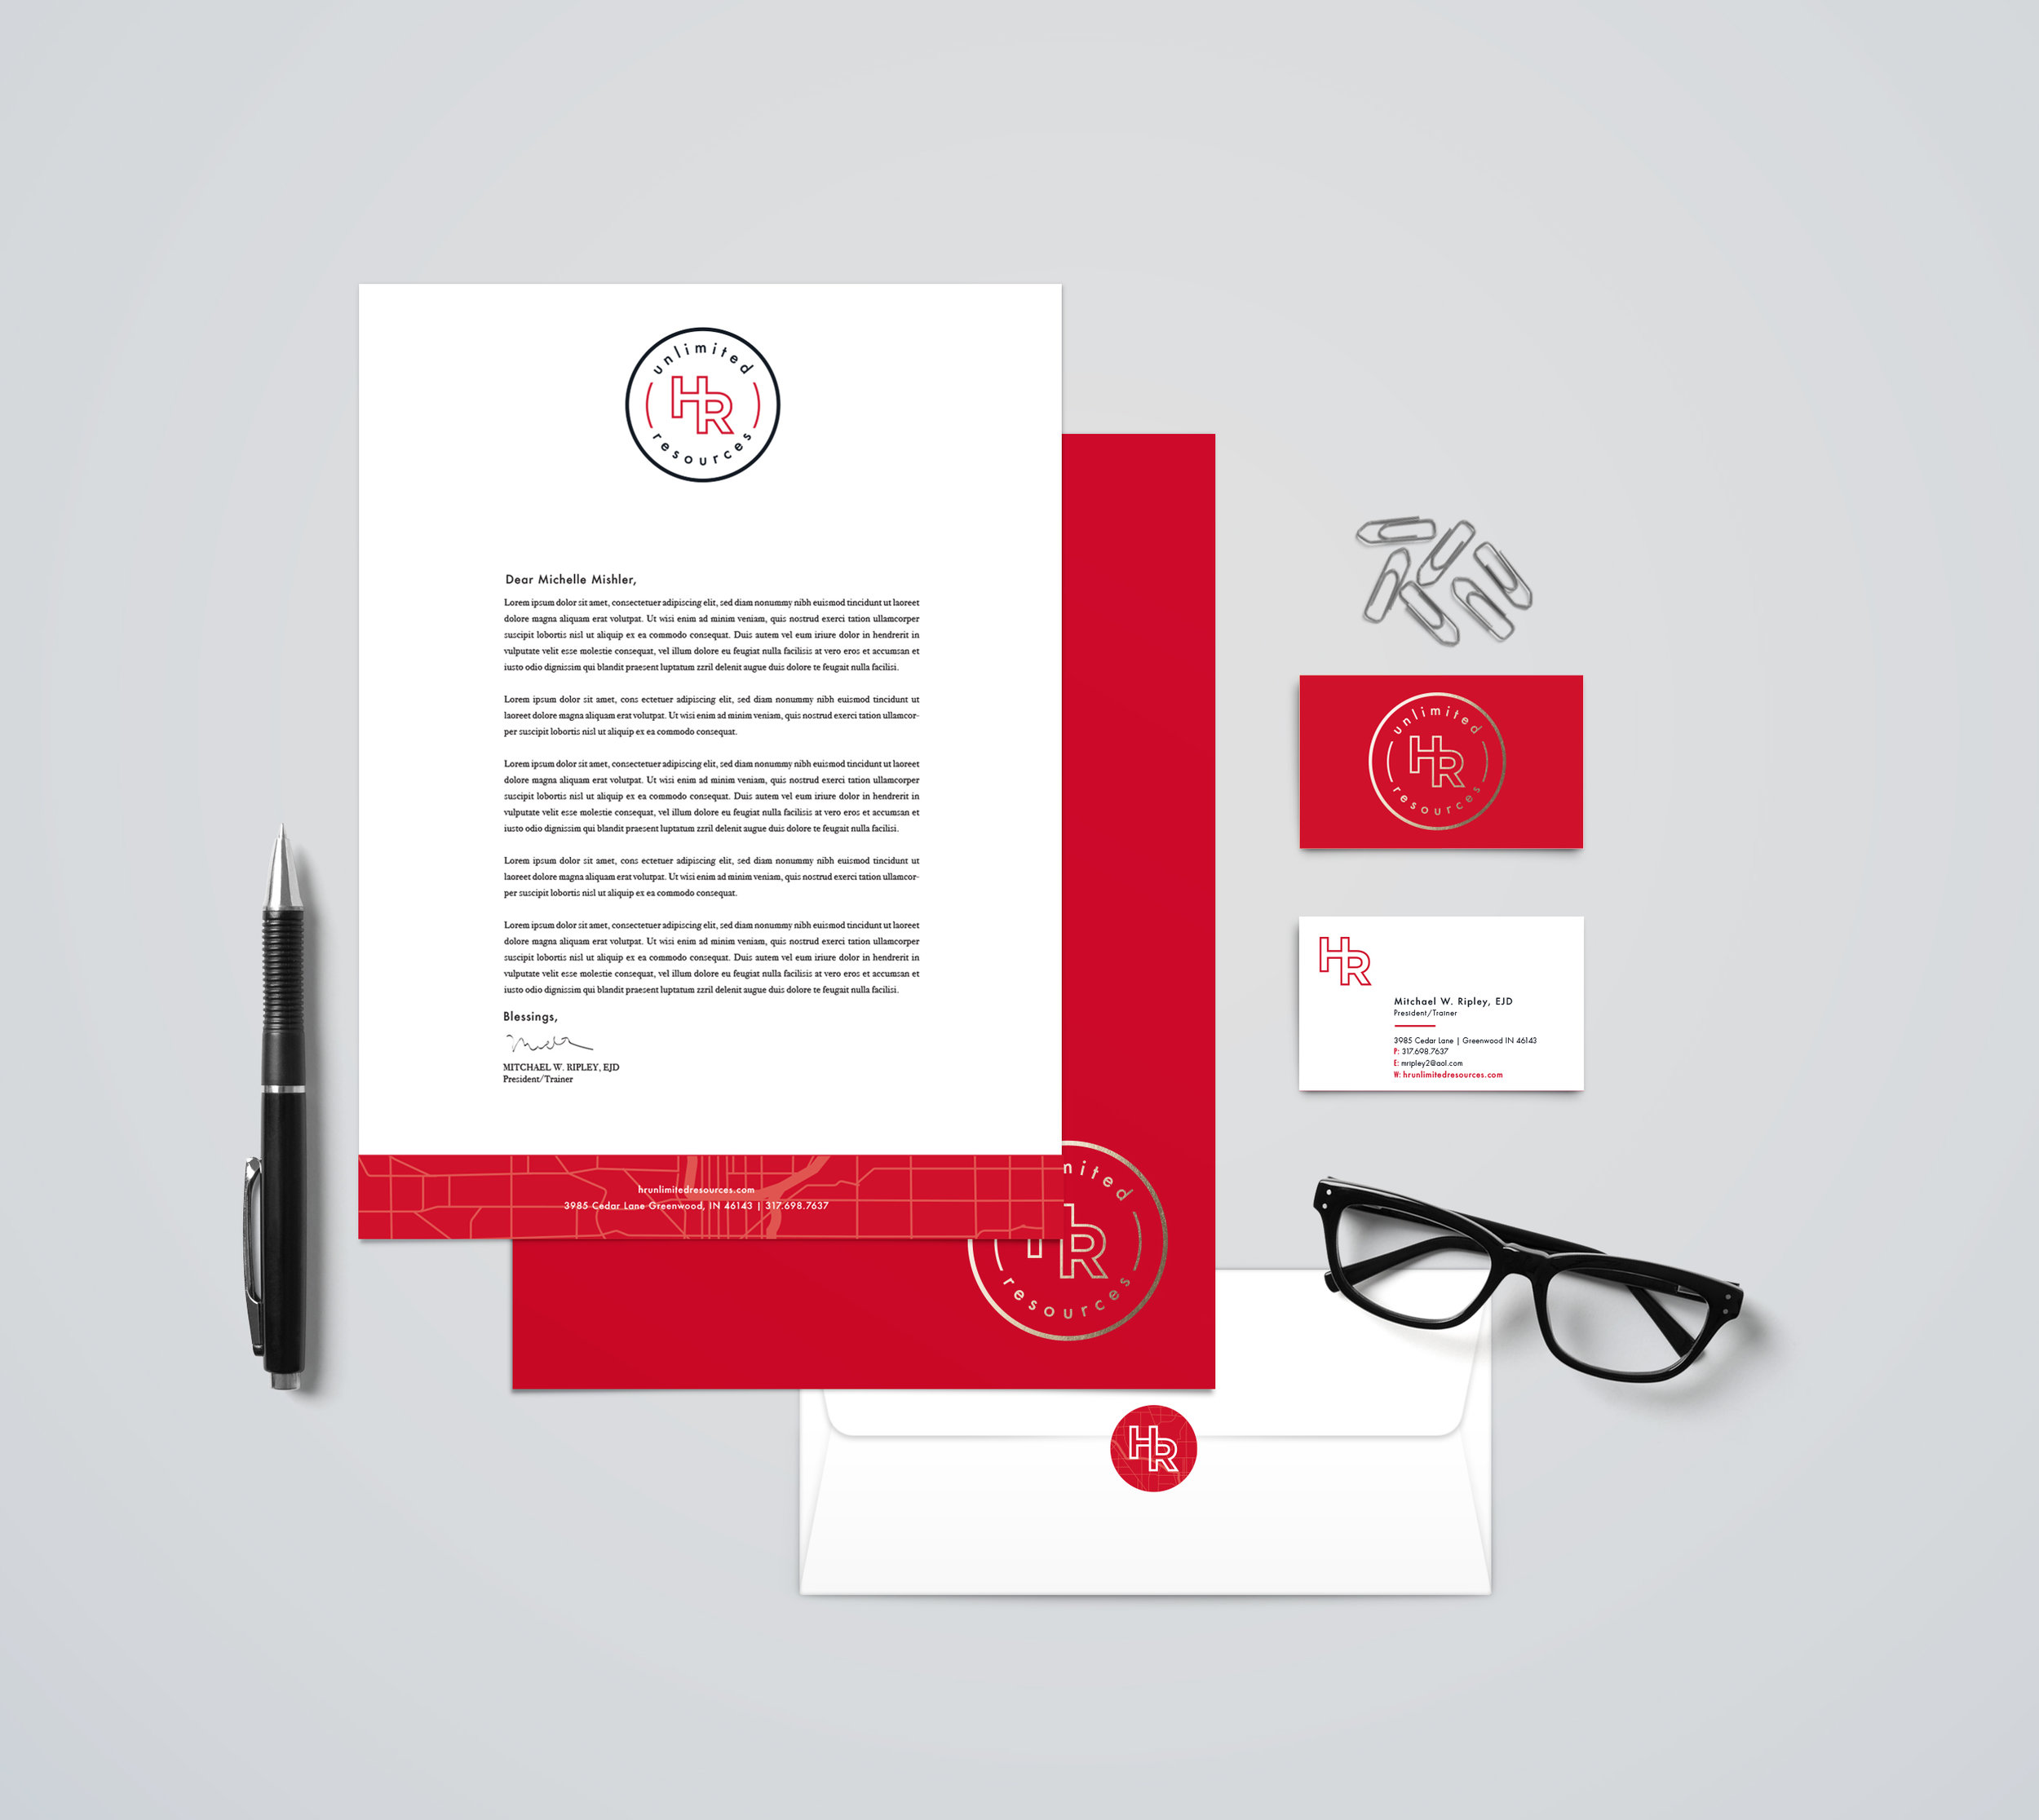 Branding-Identity-Mock-Up-2.jpg